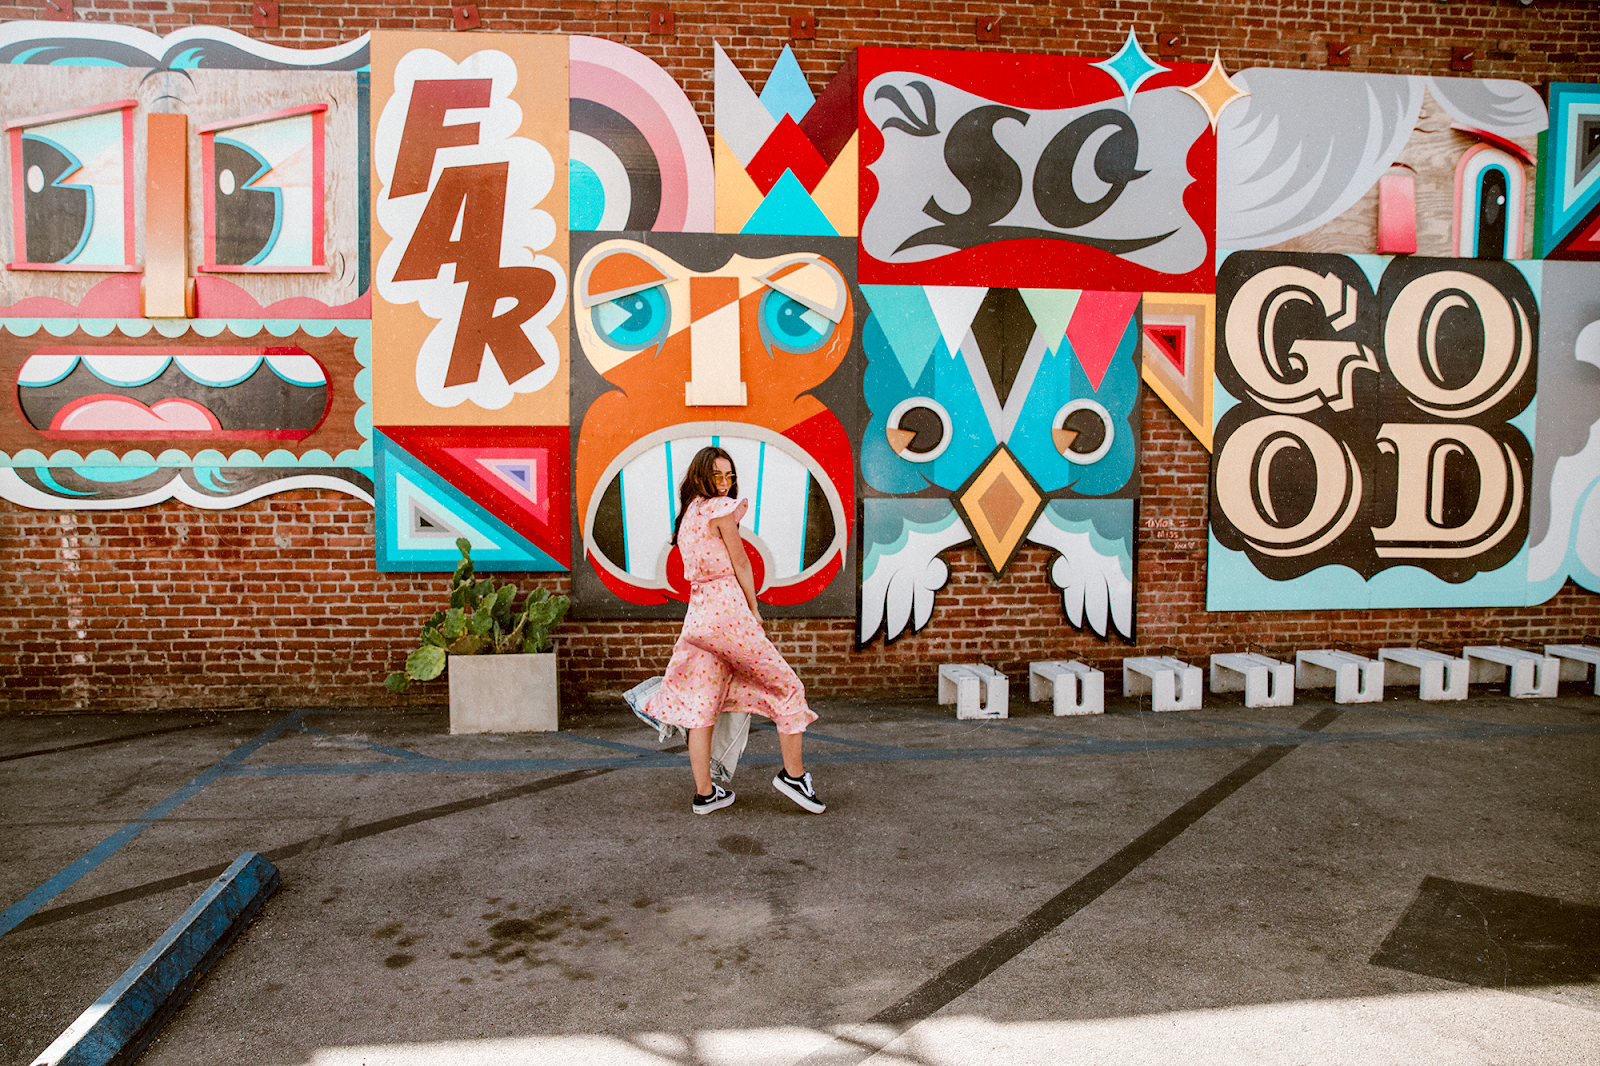 rag and bone mural on abbot kinney, venice california, shelly stuckman, arizona girl, westmoon la, vans, zara denim jacket, yellow glasses urban outfitters, old skool platform vans, journeys